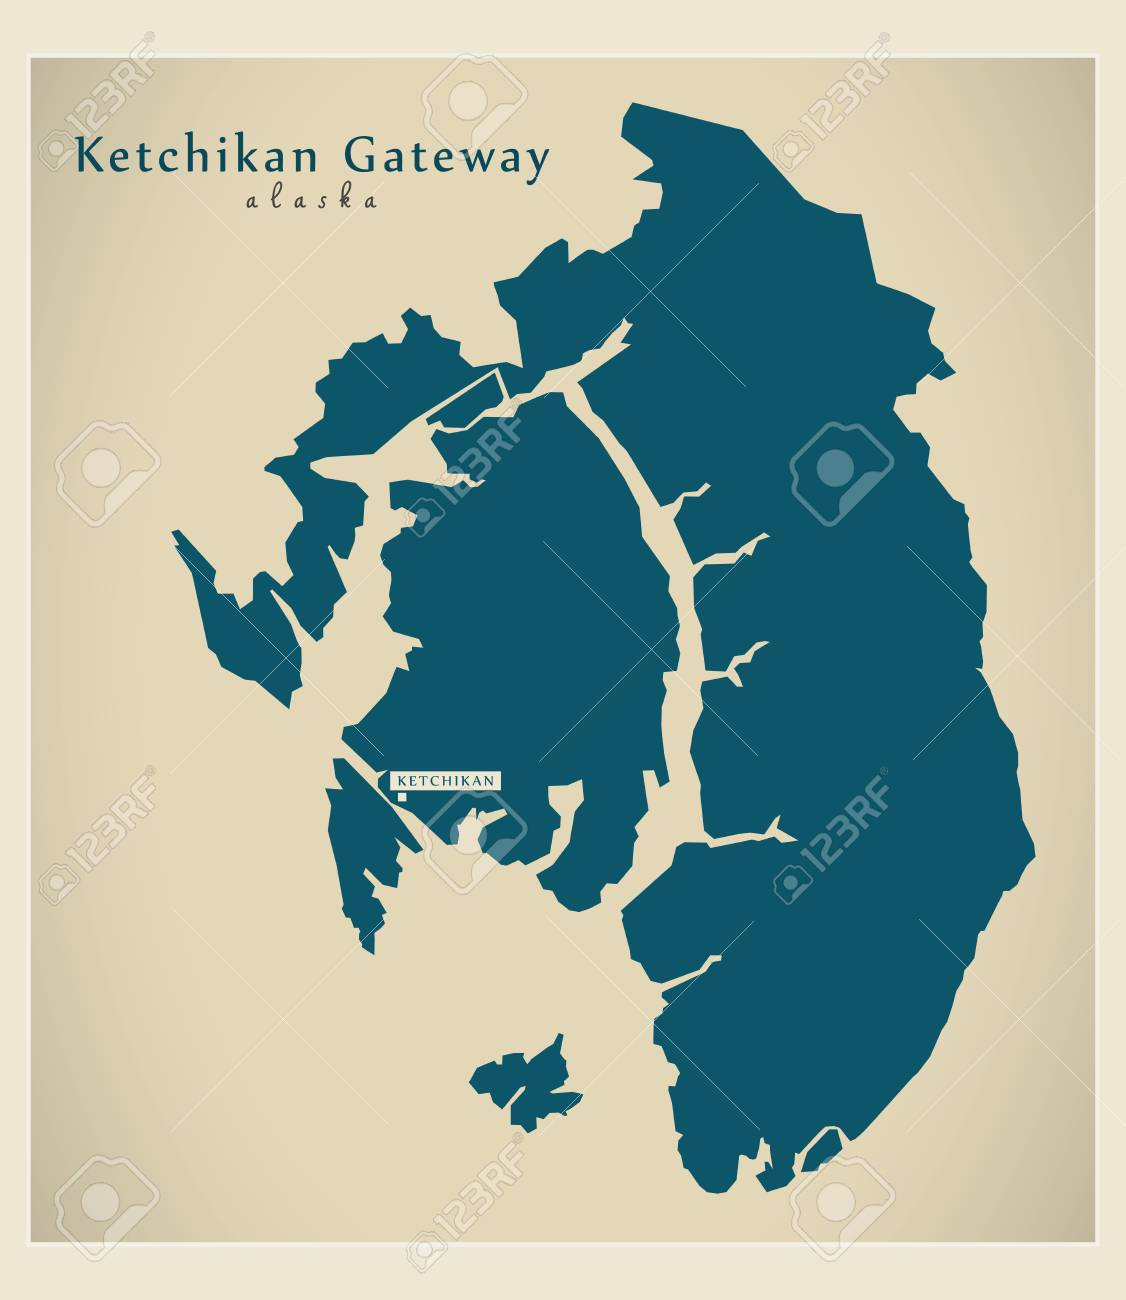 Modern Map - Ketchikan Gateway Alaska county USA illustration on sitka alaska, outline map of alaska, juneau alaska, map of homer alaska, large print map of alaska, map of wasilla alaska, map of southeast alaska, map of naknek alaska, juno alaska, ketchican alaska, skagway alaska, map of seward alaska, map of alaska inside passage, map of kotzebue alaska, map of craig alaska, map of alaska and canada, map of vancouver bc, road map of alaska, map of denali alaska, map of hoonah alaska,